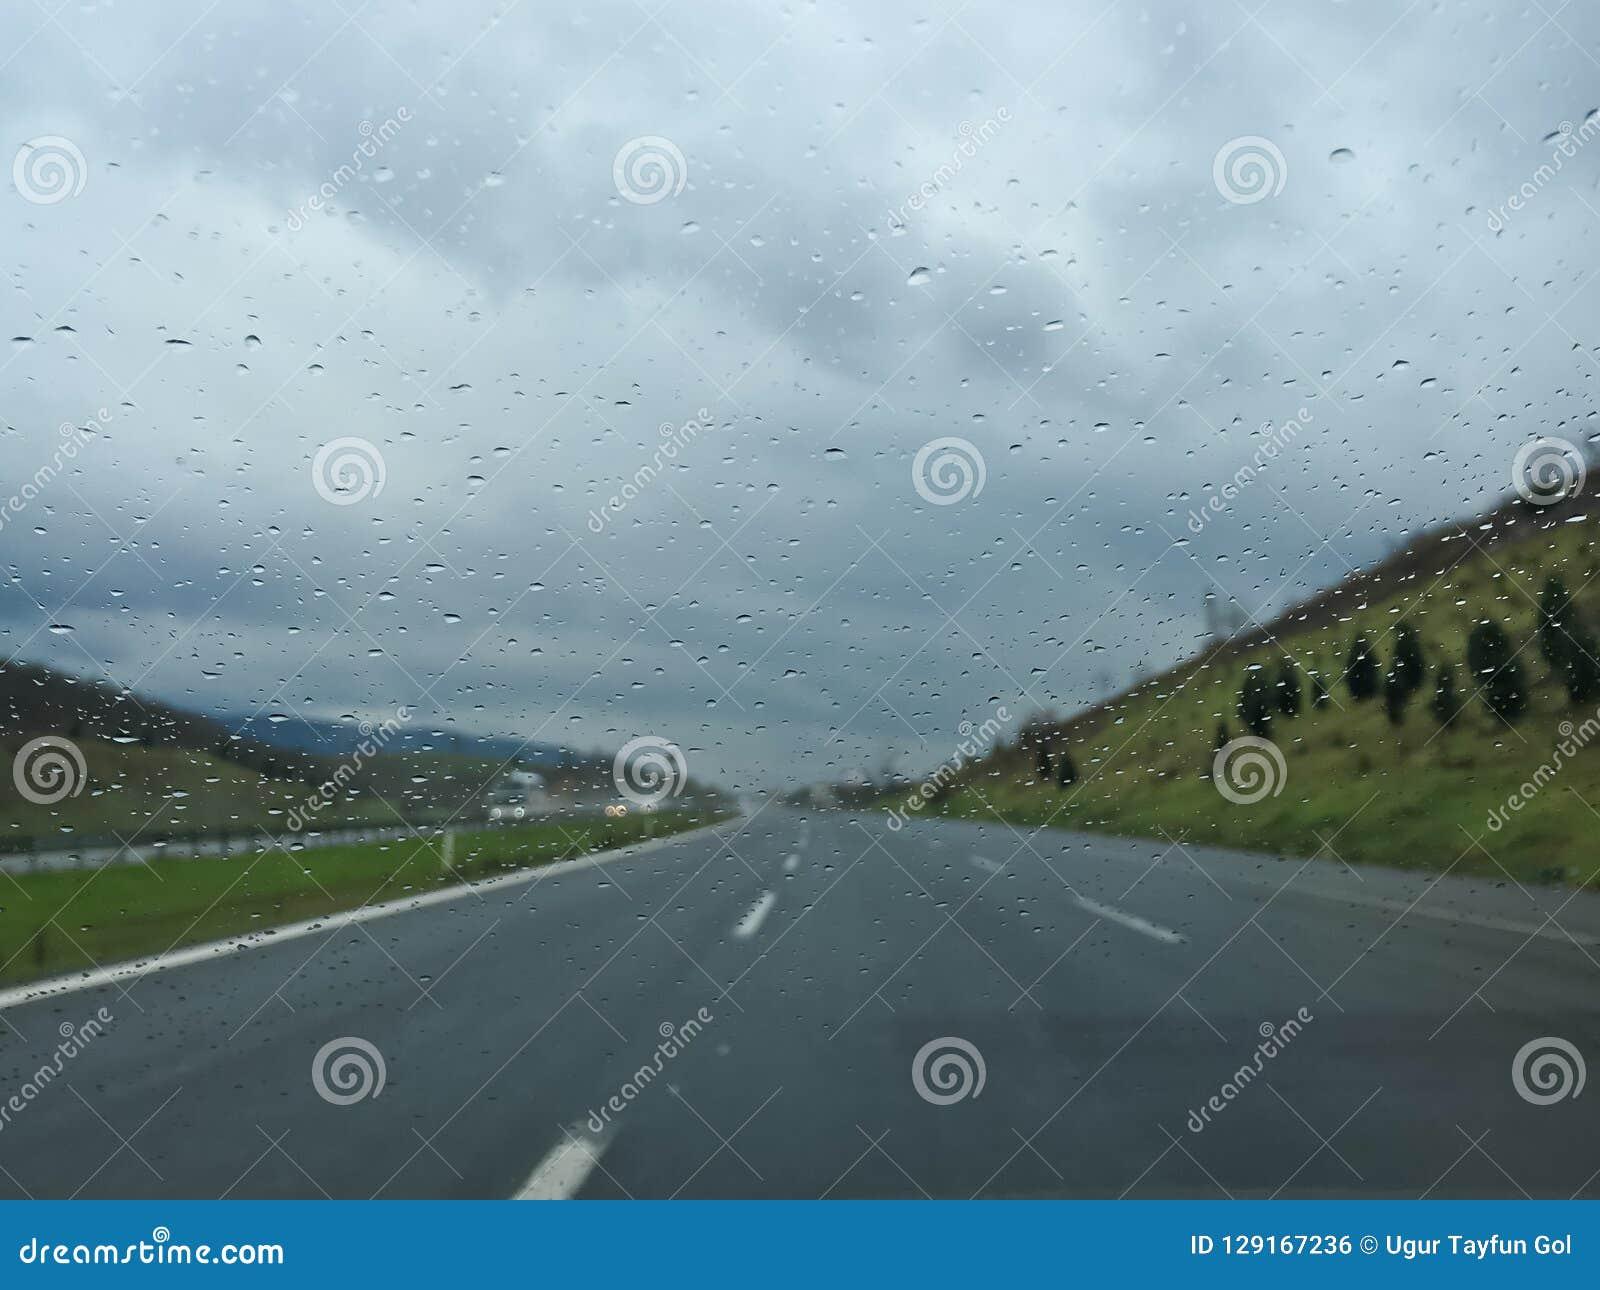 Conduzindo o dia chuvoso na estrada